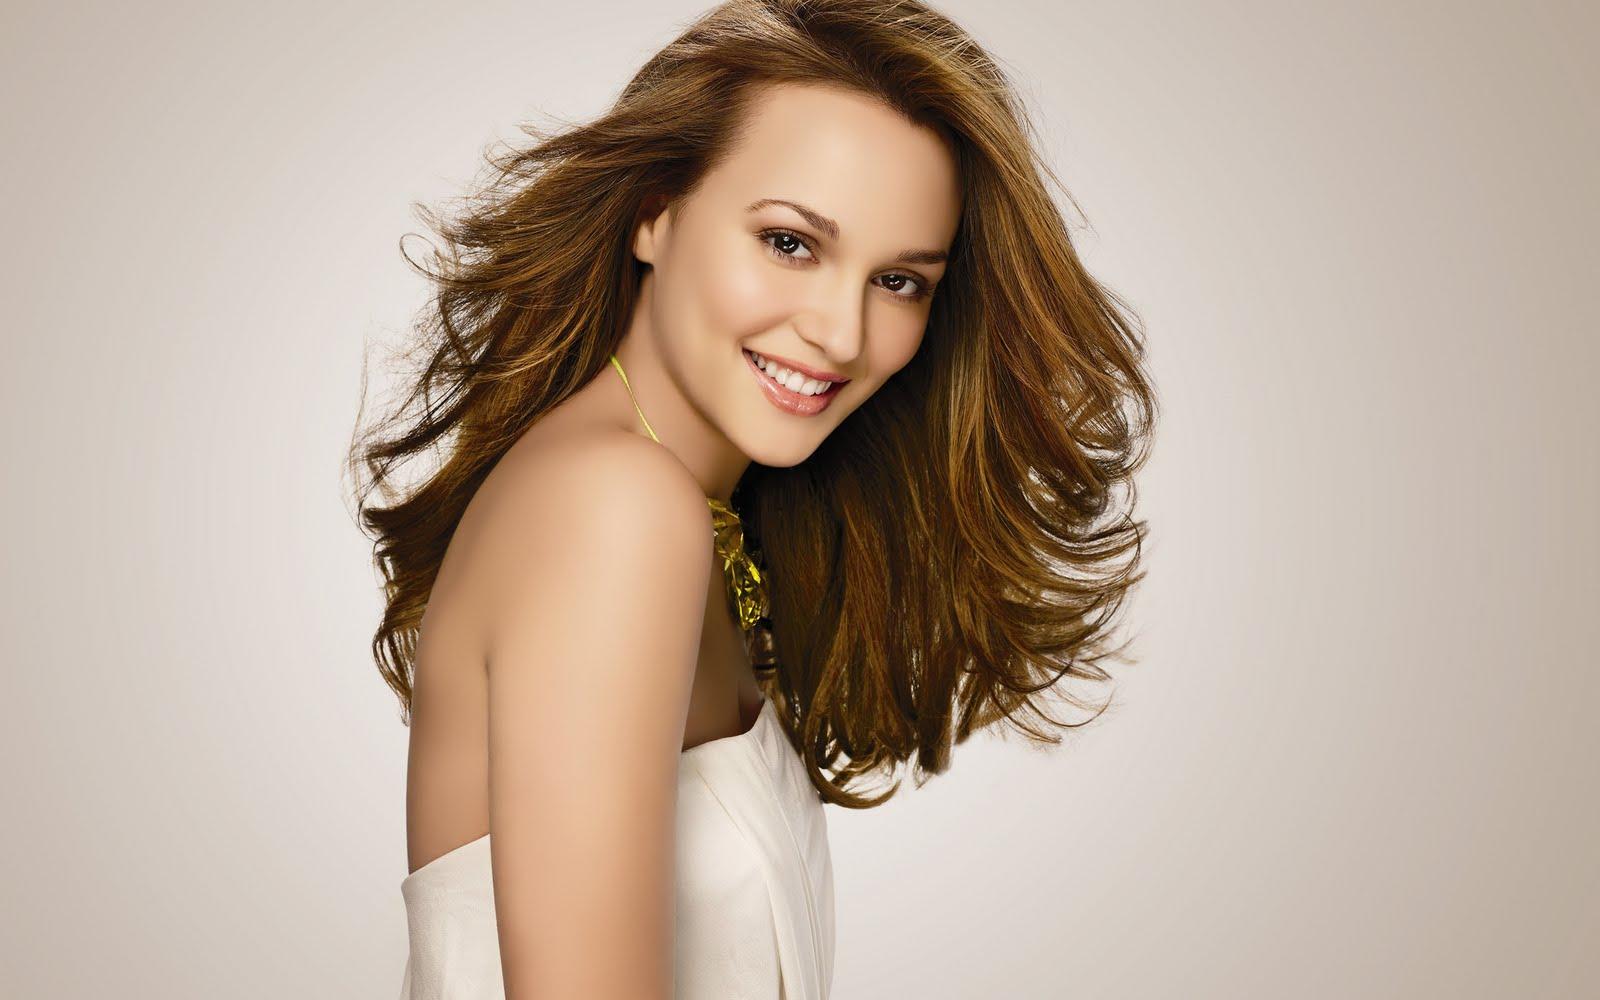 Wallpapers Model Celebrity Girl - Home | Facebook